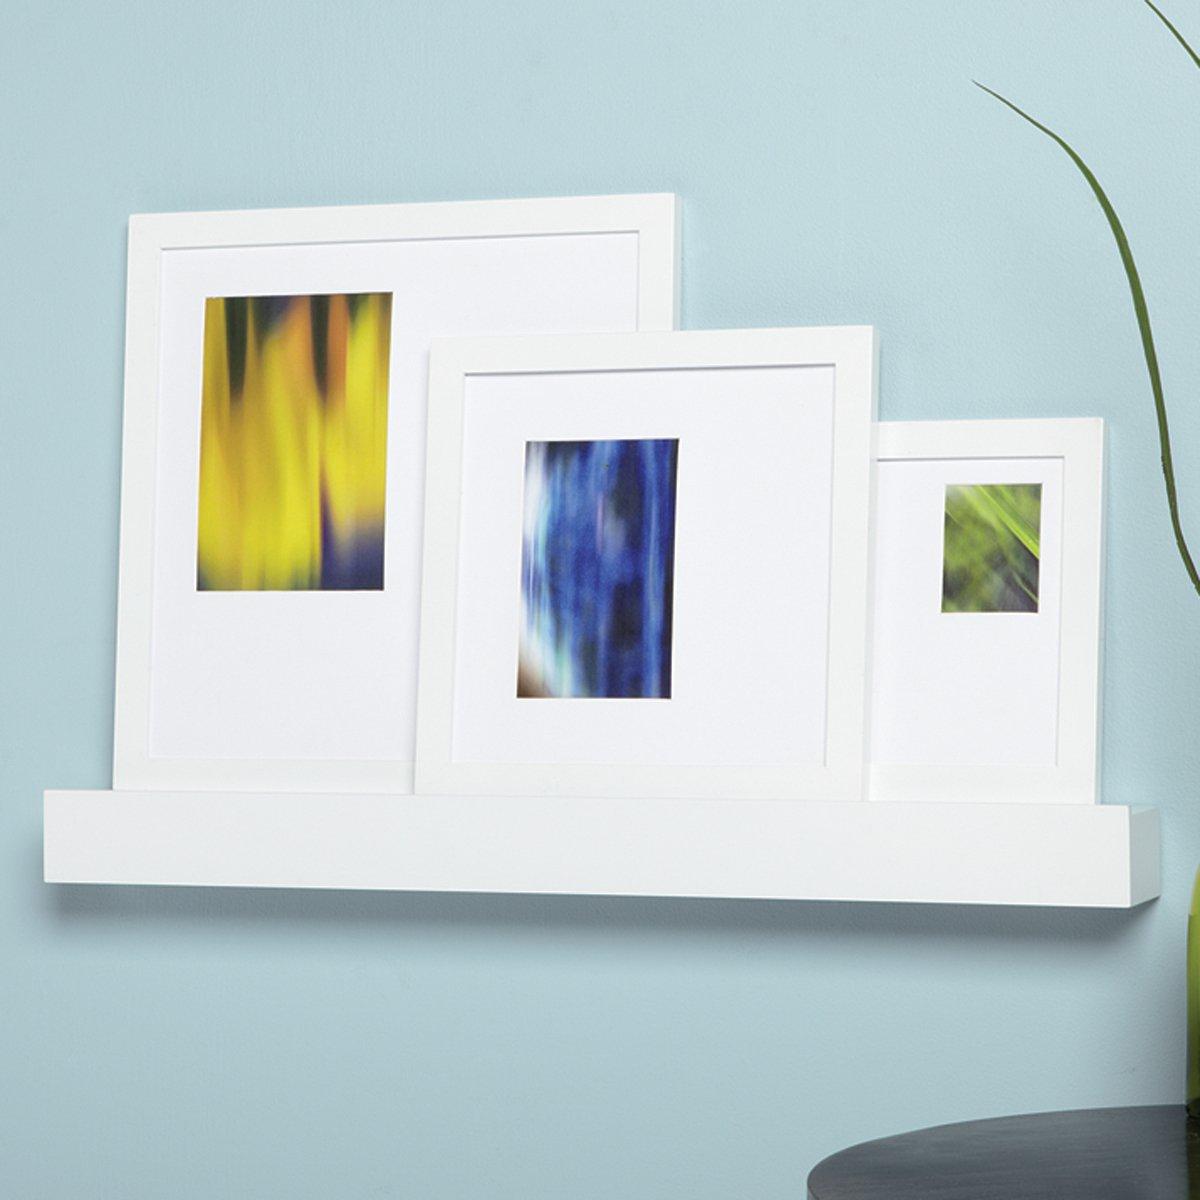 amazon com nexxt citi modern frames and wall shelf 24 inch shelf